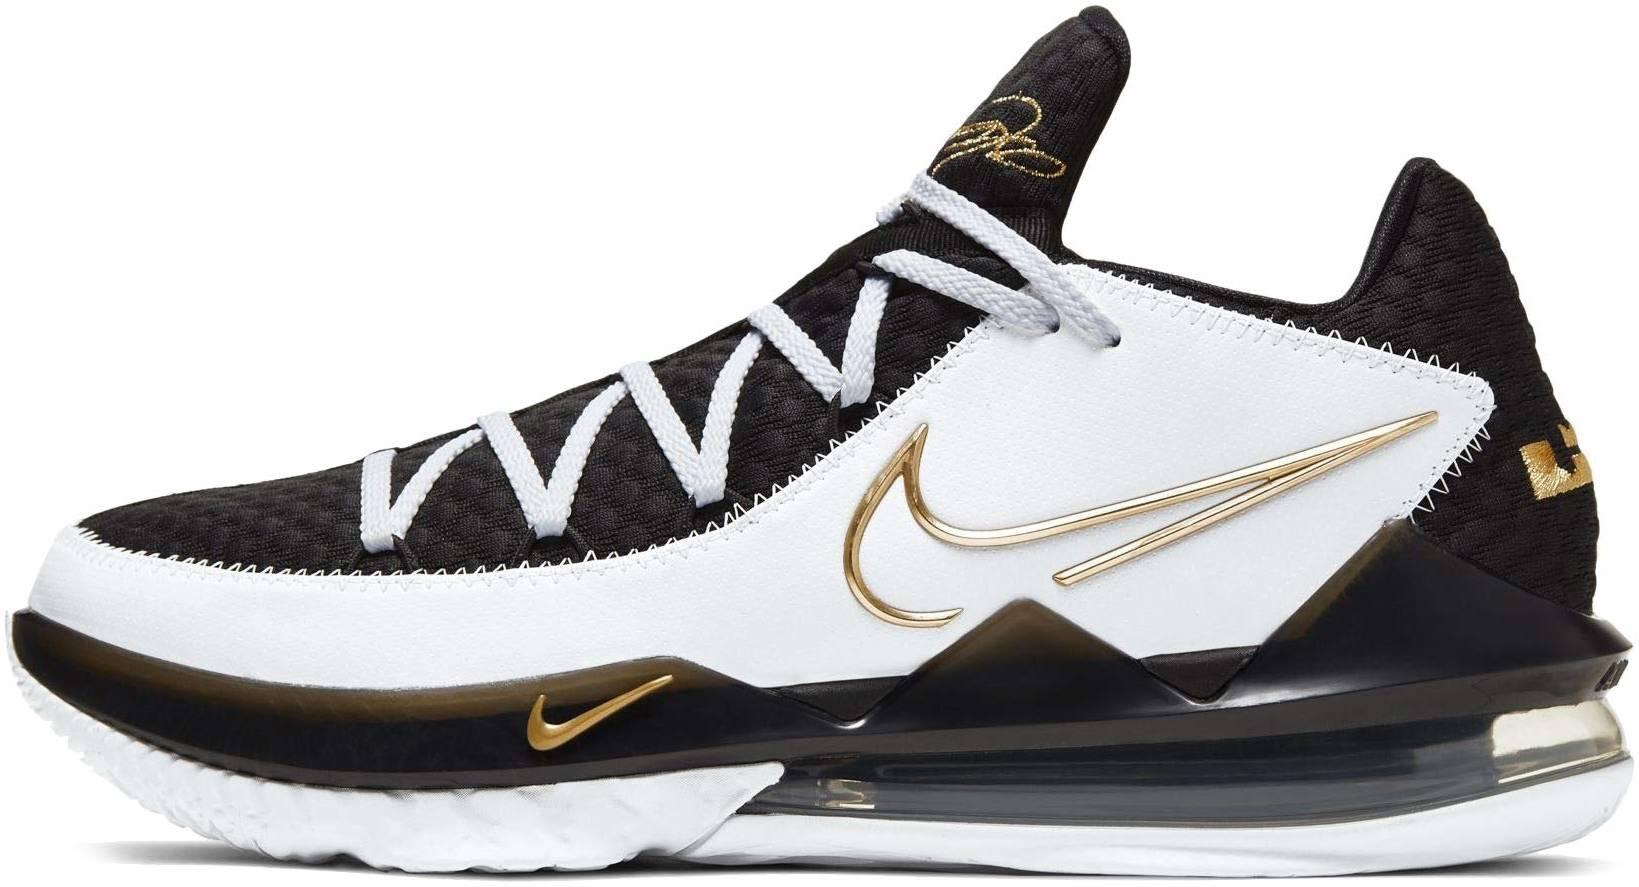 Nike Lebron 17 Low - Deals ($139), Facts, Reviews (2021) | RunRepeat